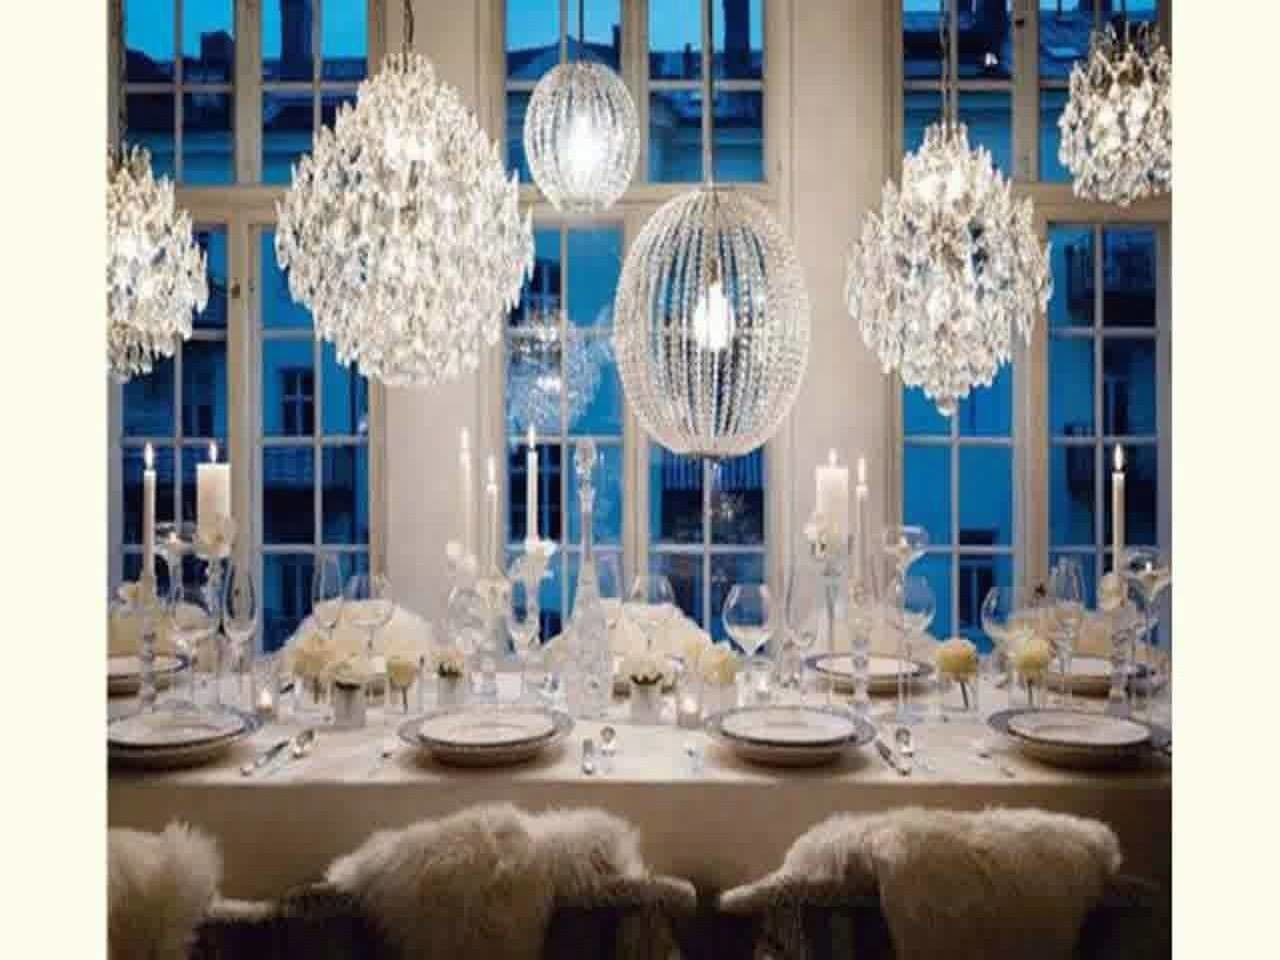 Wedding aisle decor ideas diy  Diy Wedding Decoration Ideas   wedding  Pinterest  Diy